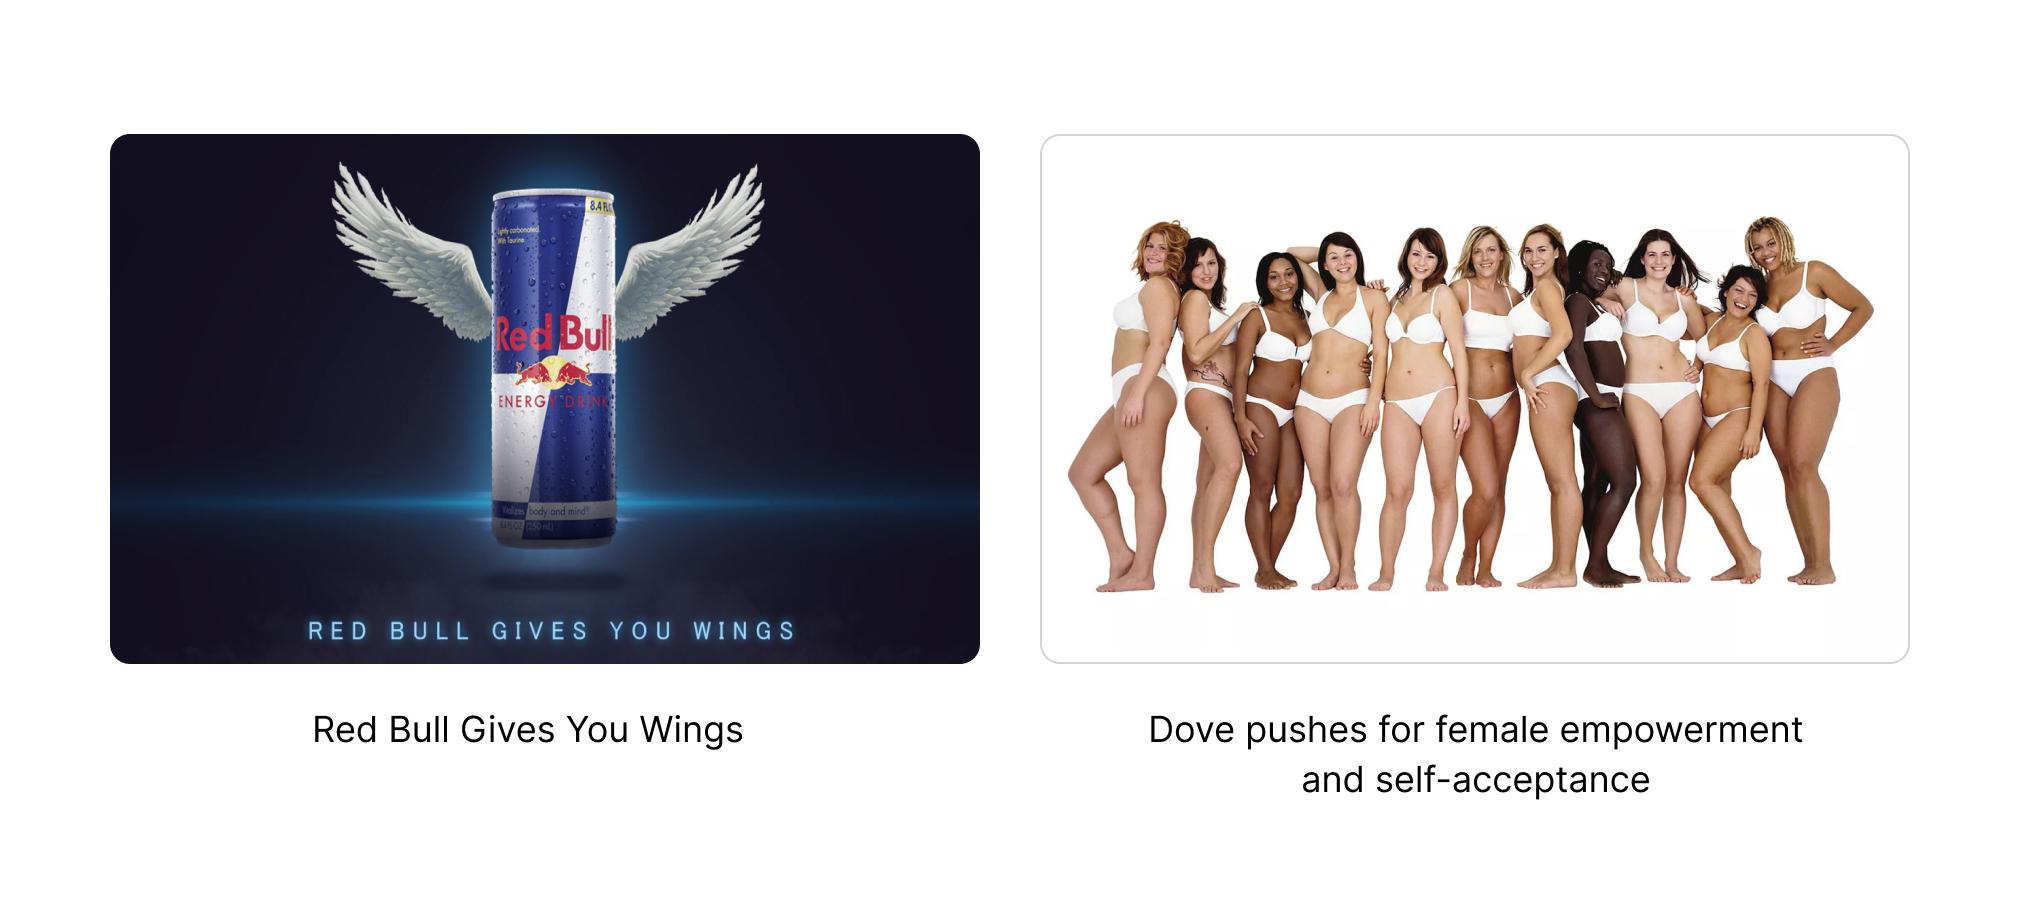 Brand essence examples